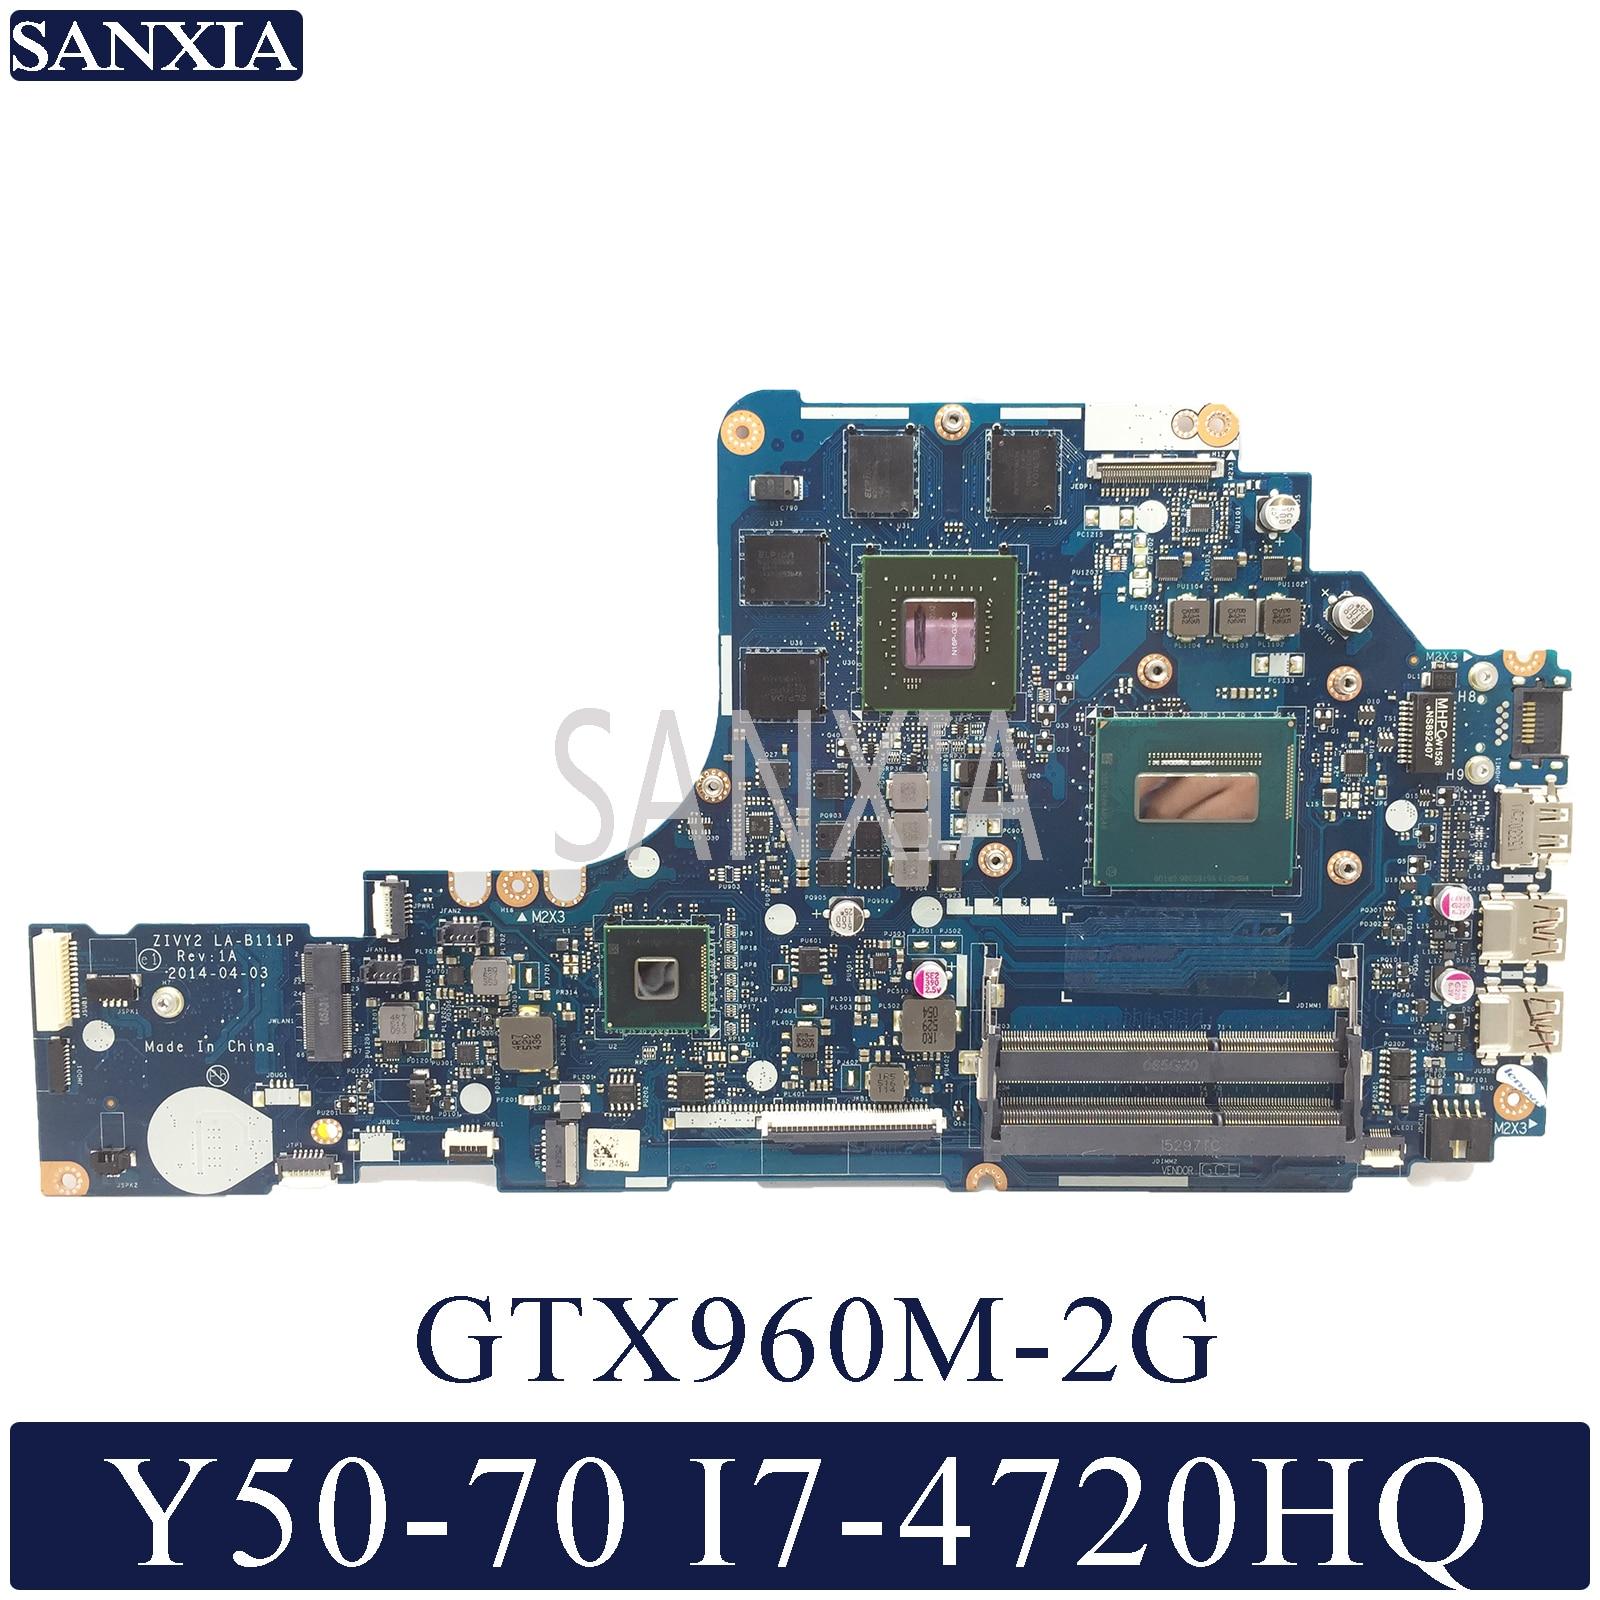 KEFU LA-B111P Laptop Motherboard For Lenovo Y50-70 Original Mainboard I7-4720HQ/4710HQ GTX960M-2G